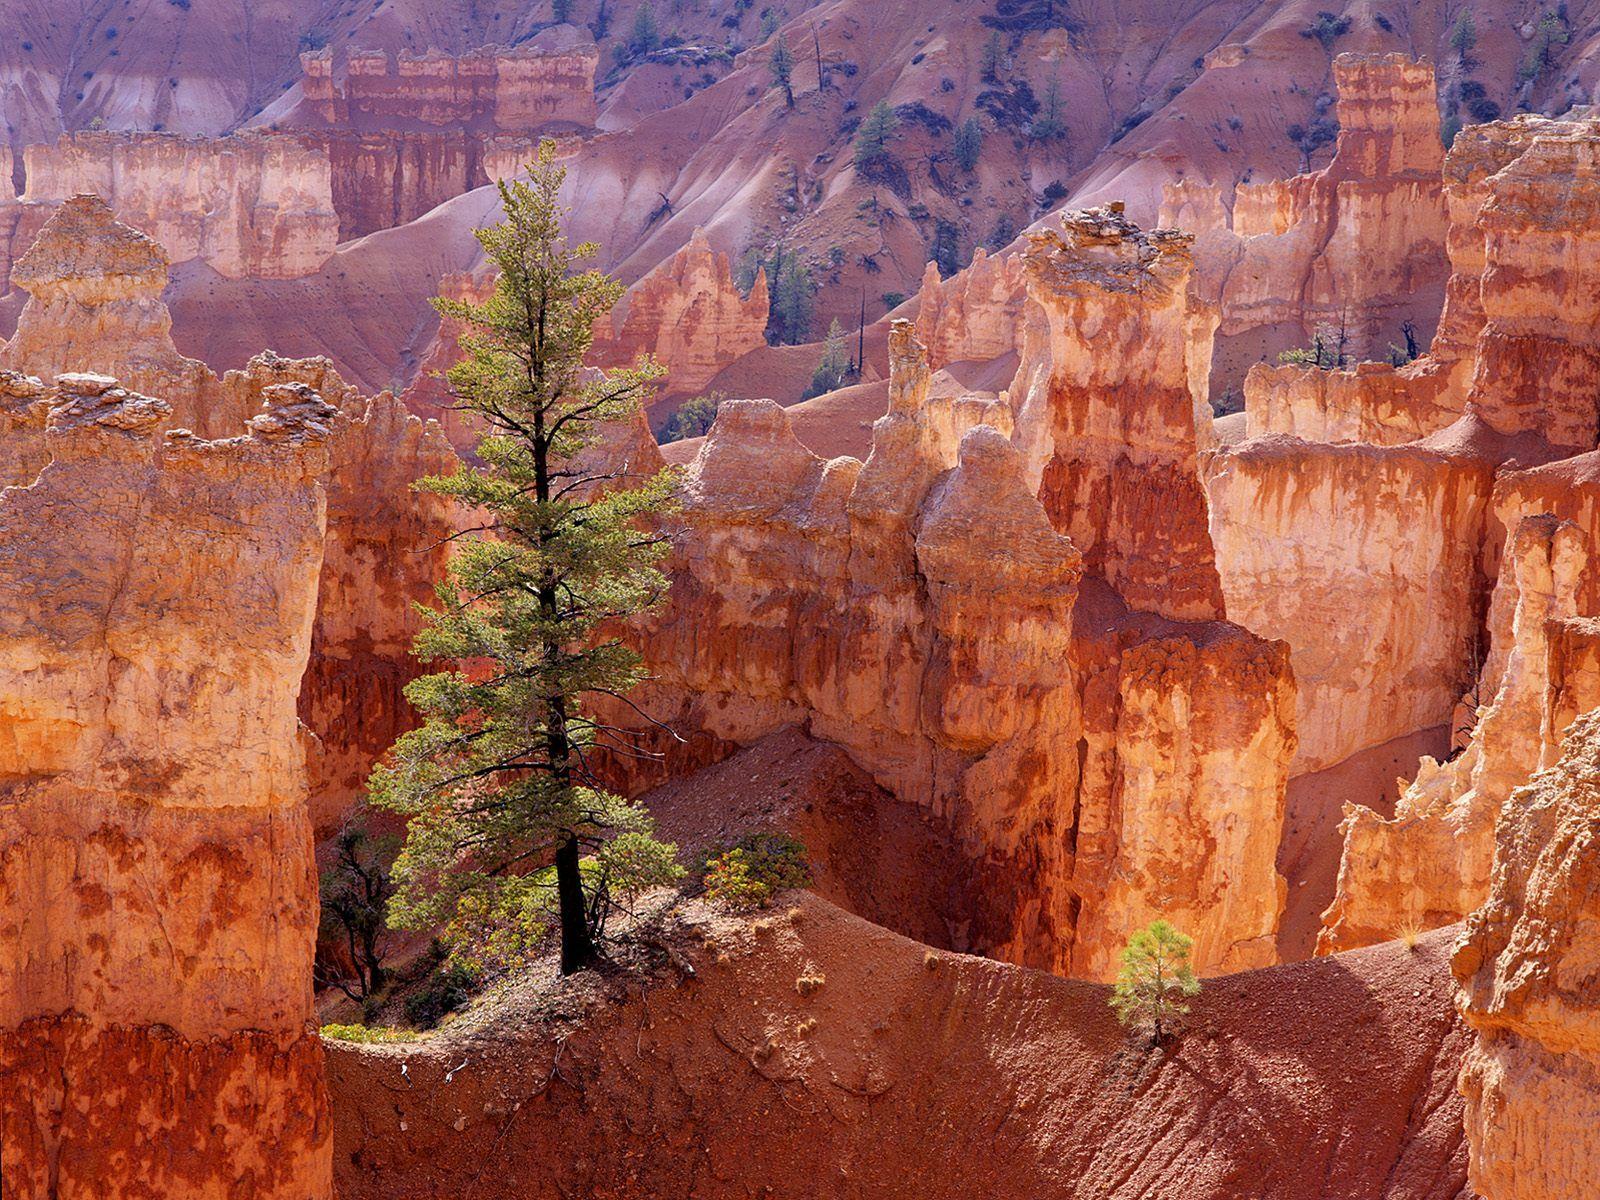 Bryce Canyon, Utah USA [OC] [5616x3159] : EarthPorn